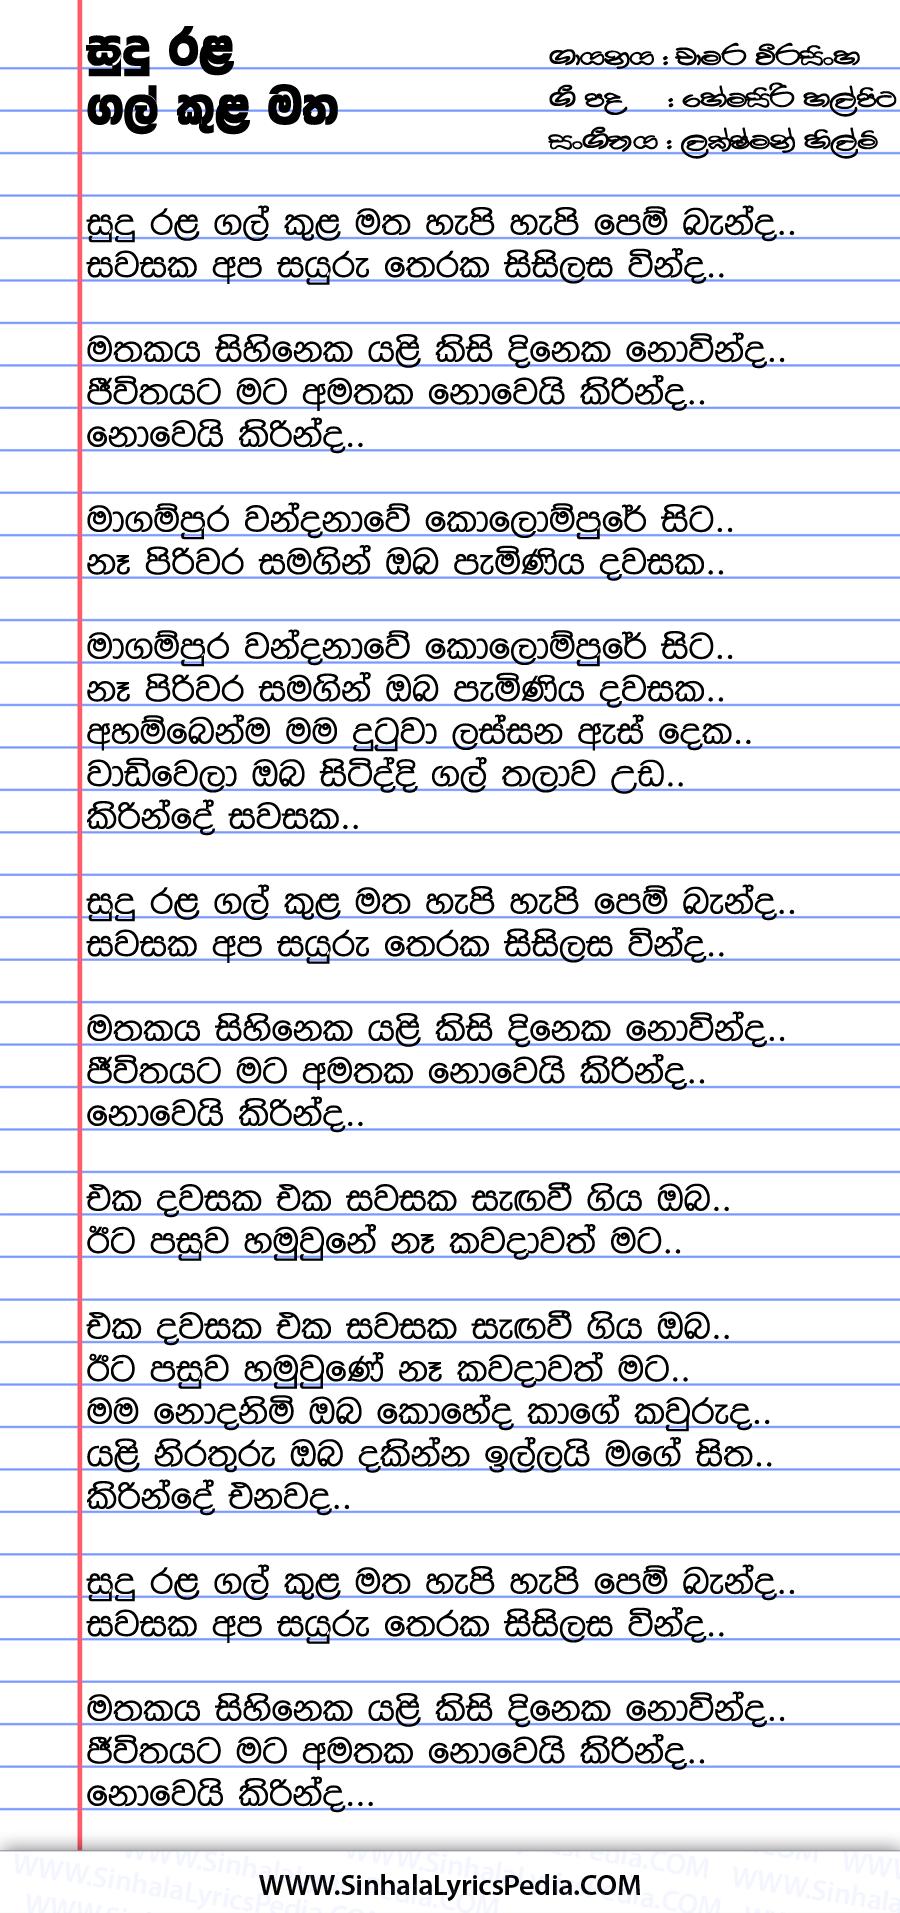 Sudu Rala Gal Kula Matha Song Lyrics